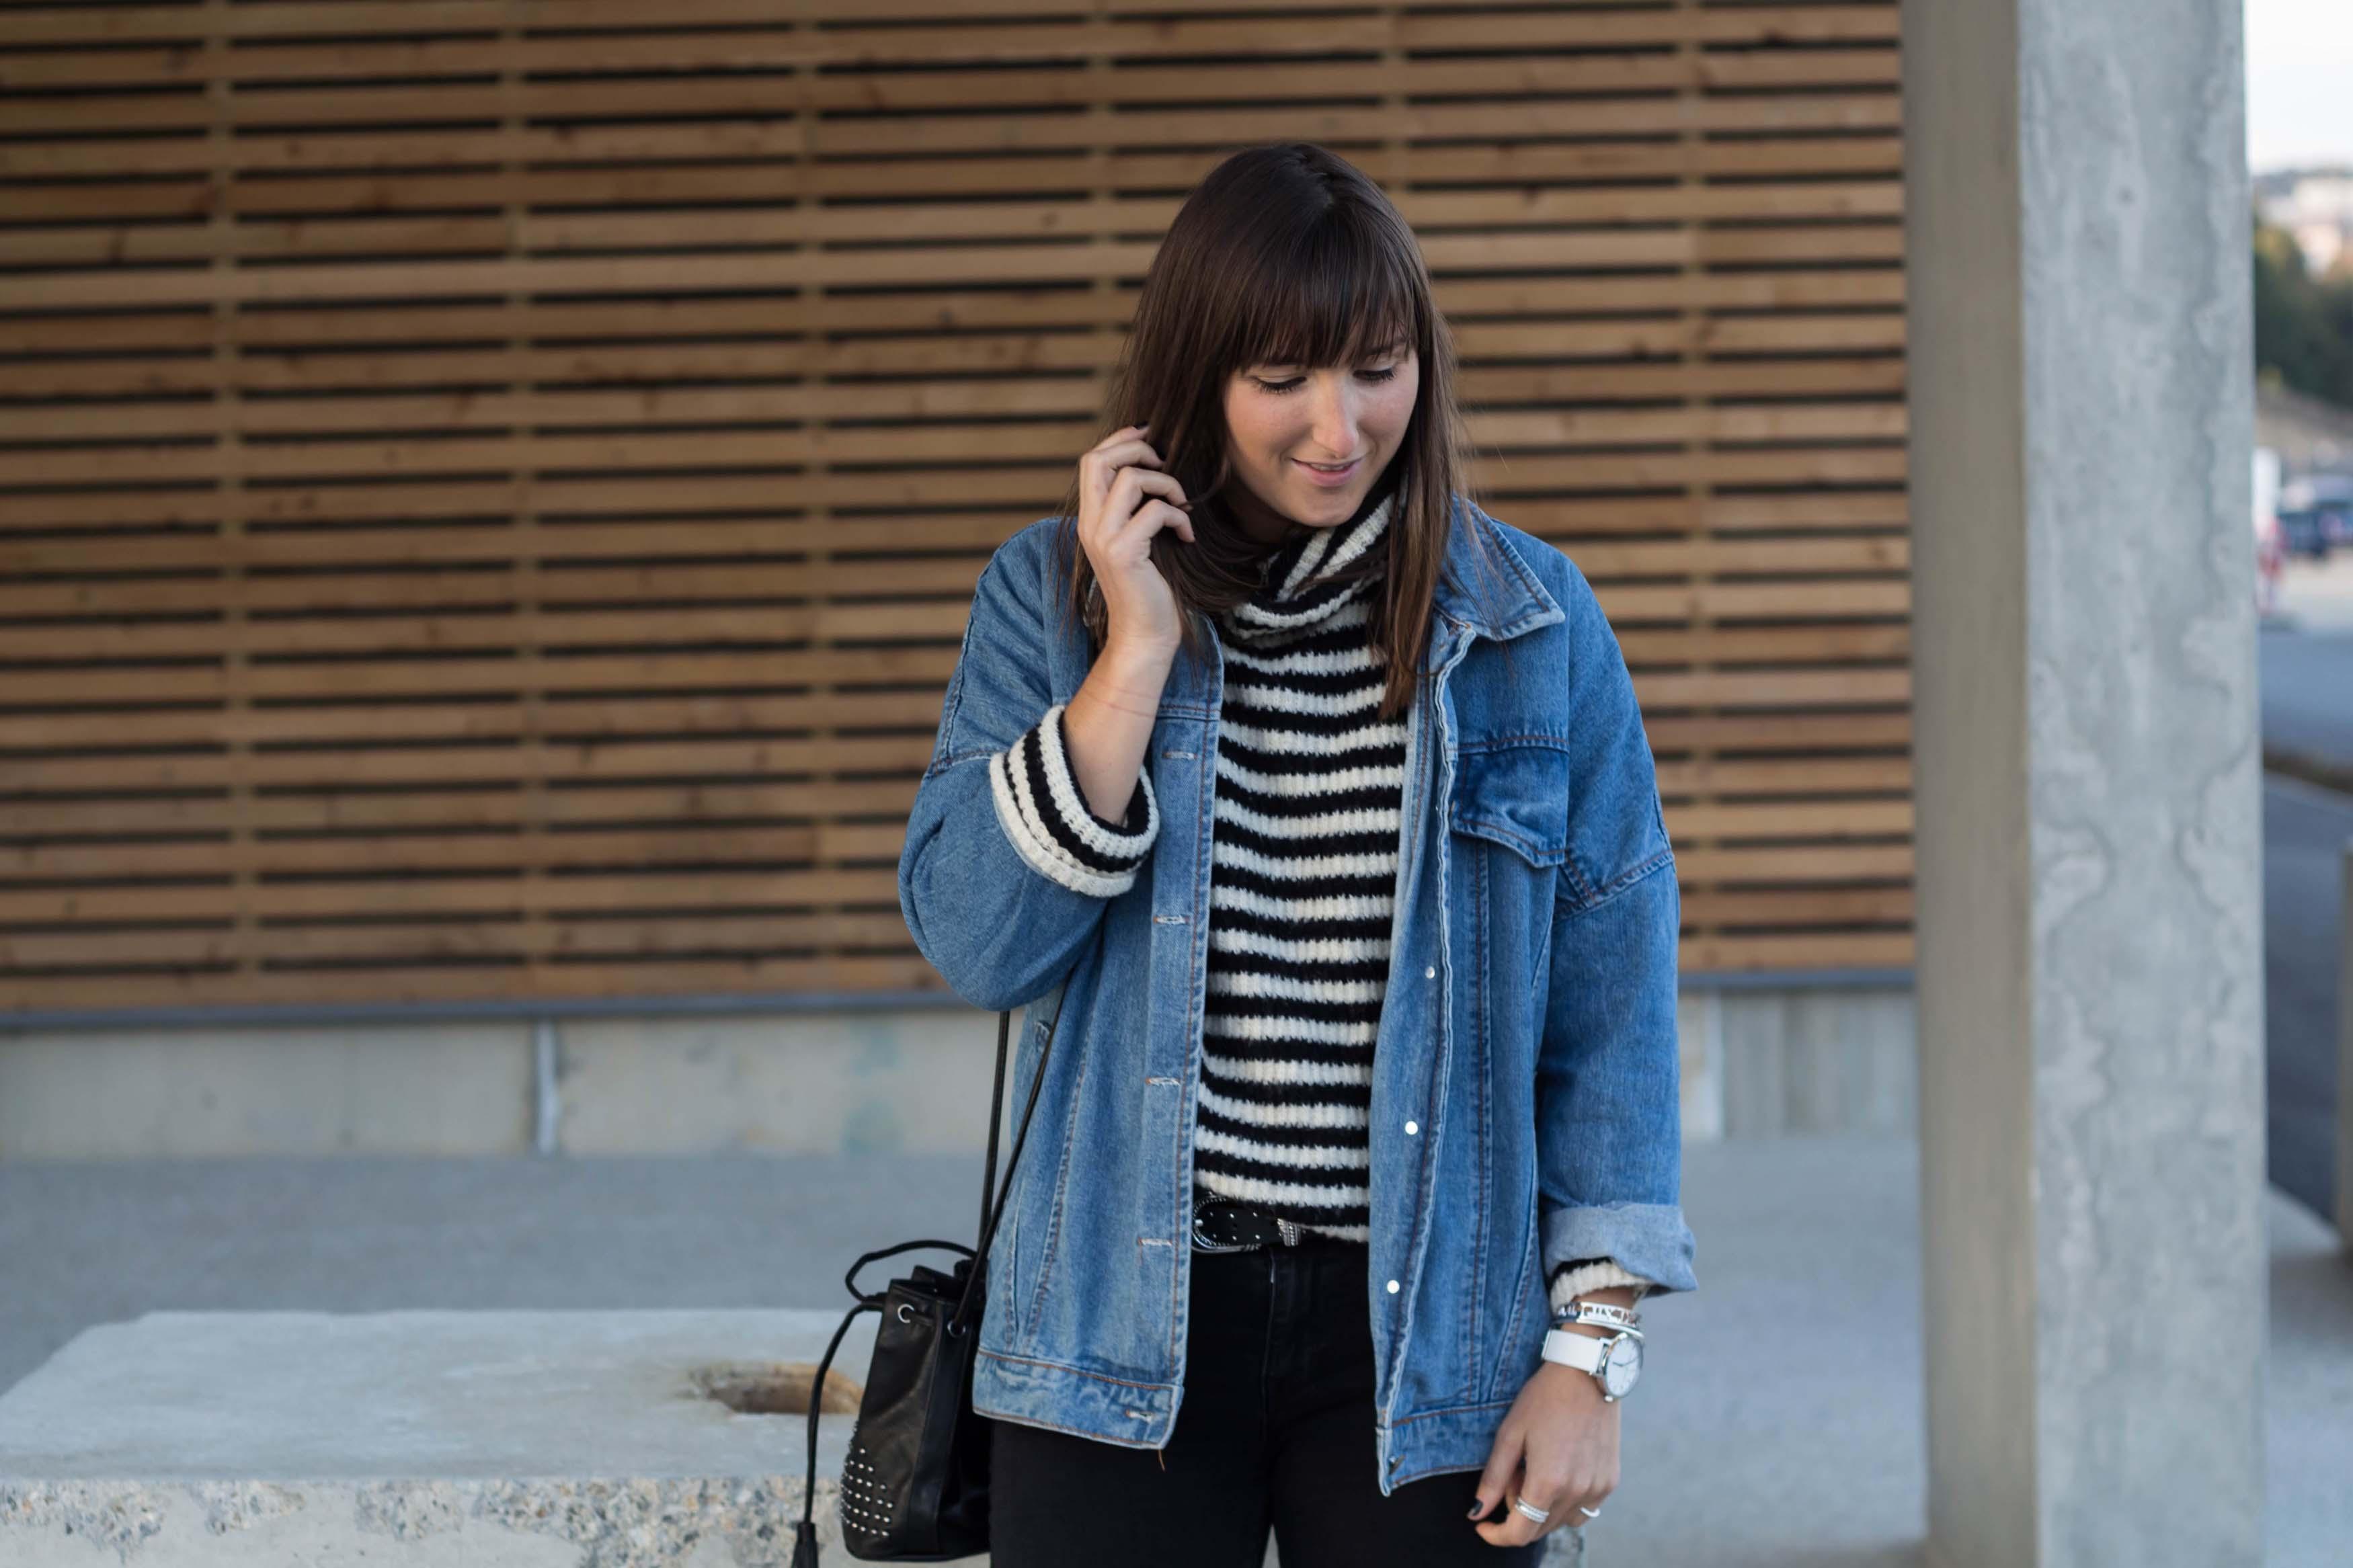 blog-mode-jean-shein-linstantflo-11-sur-18